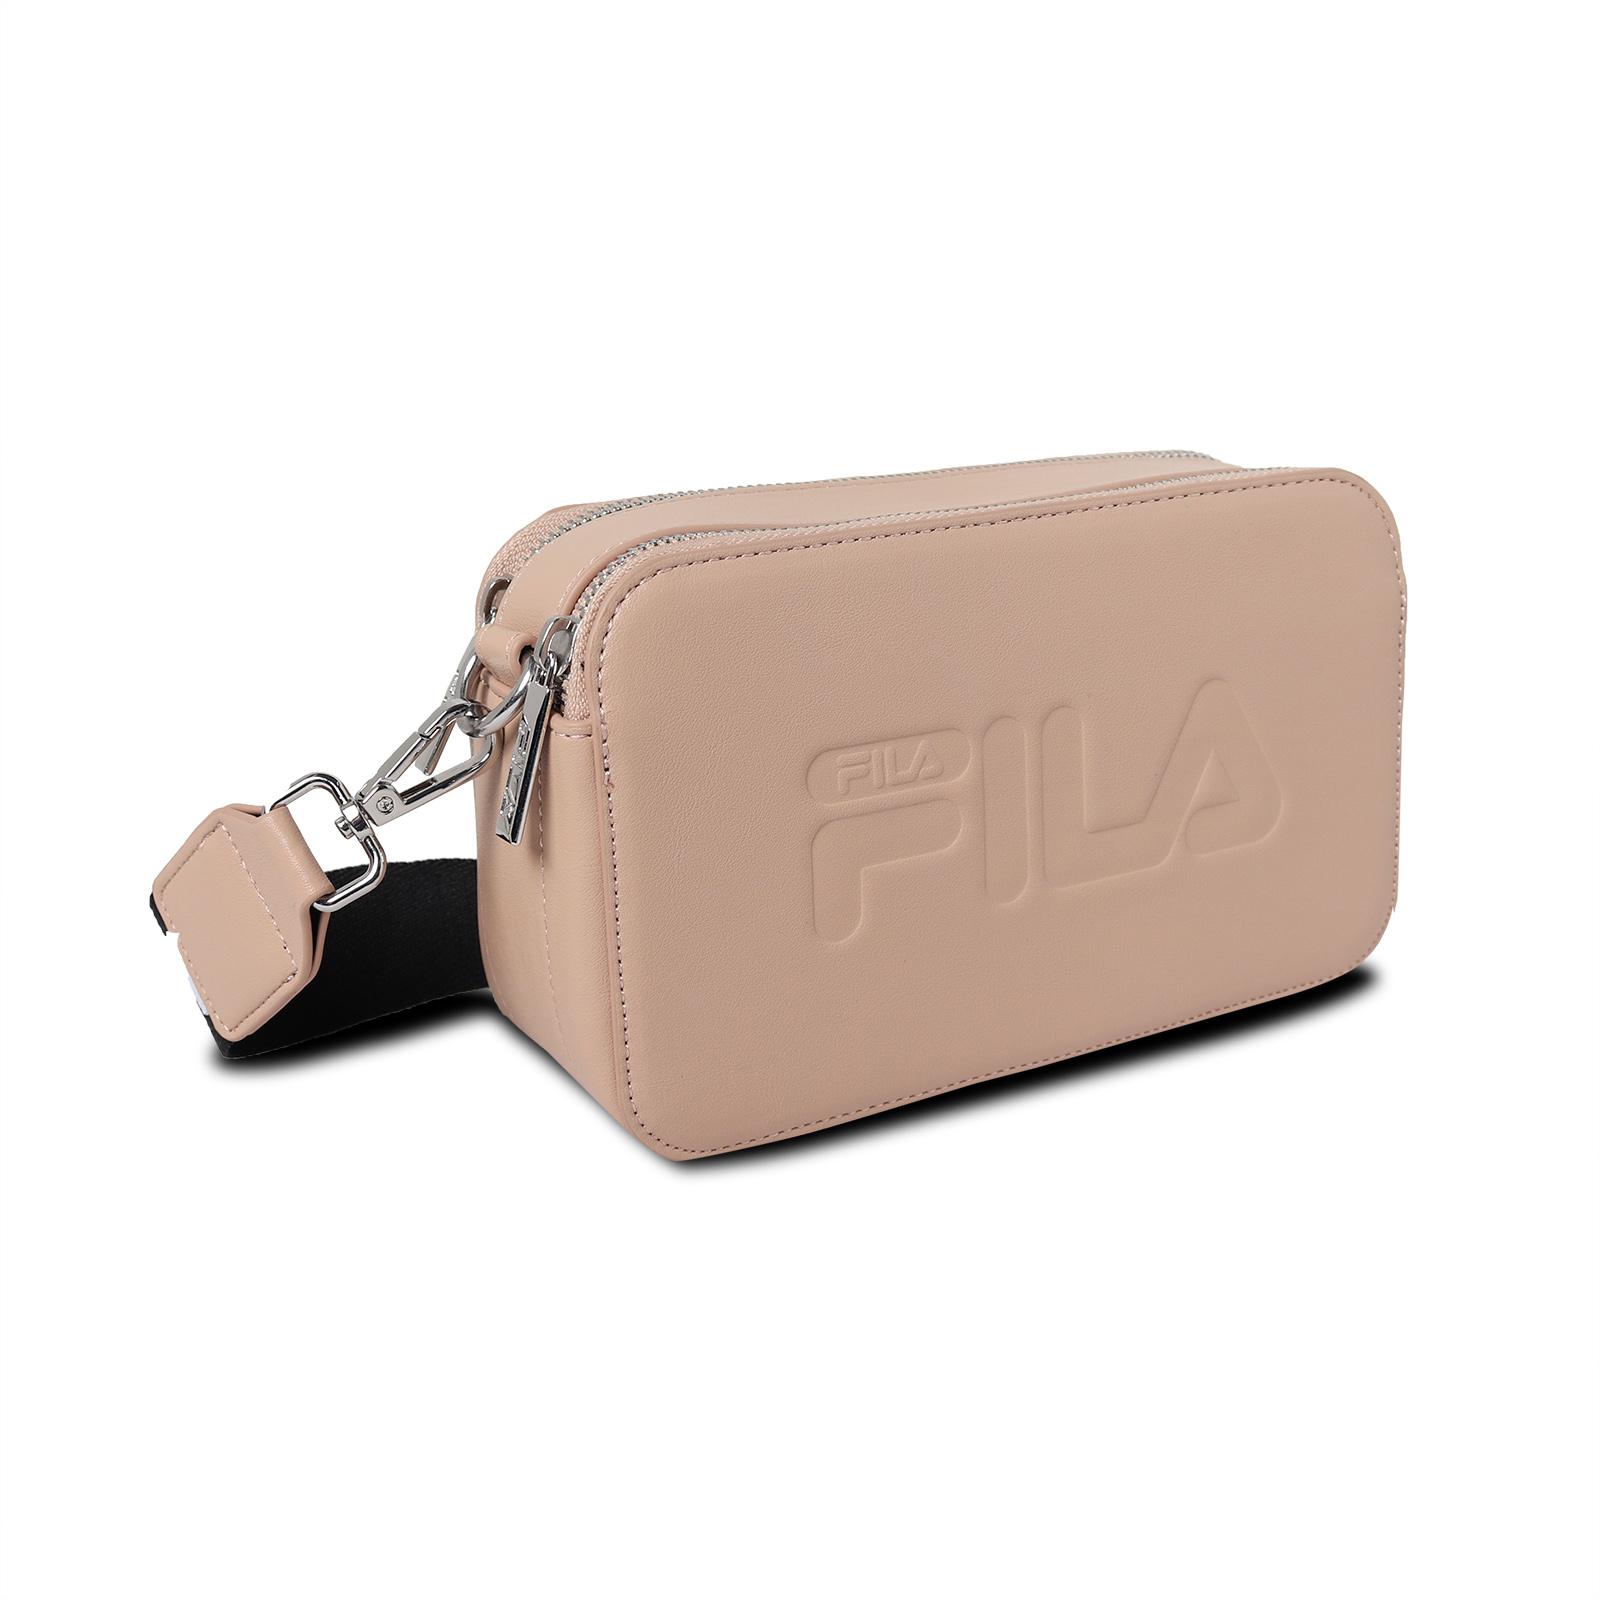 Fila 斜背包 Logo Camera Bag 男女款 粉膚色 相機包 運動休閒【ACS】 BMV3015KK